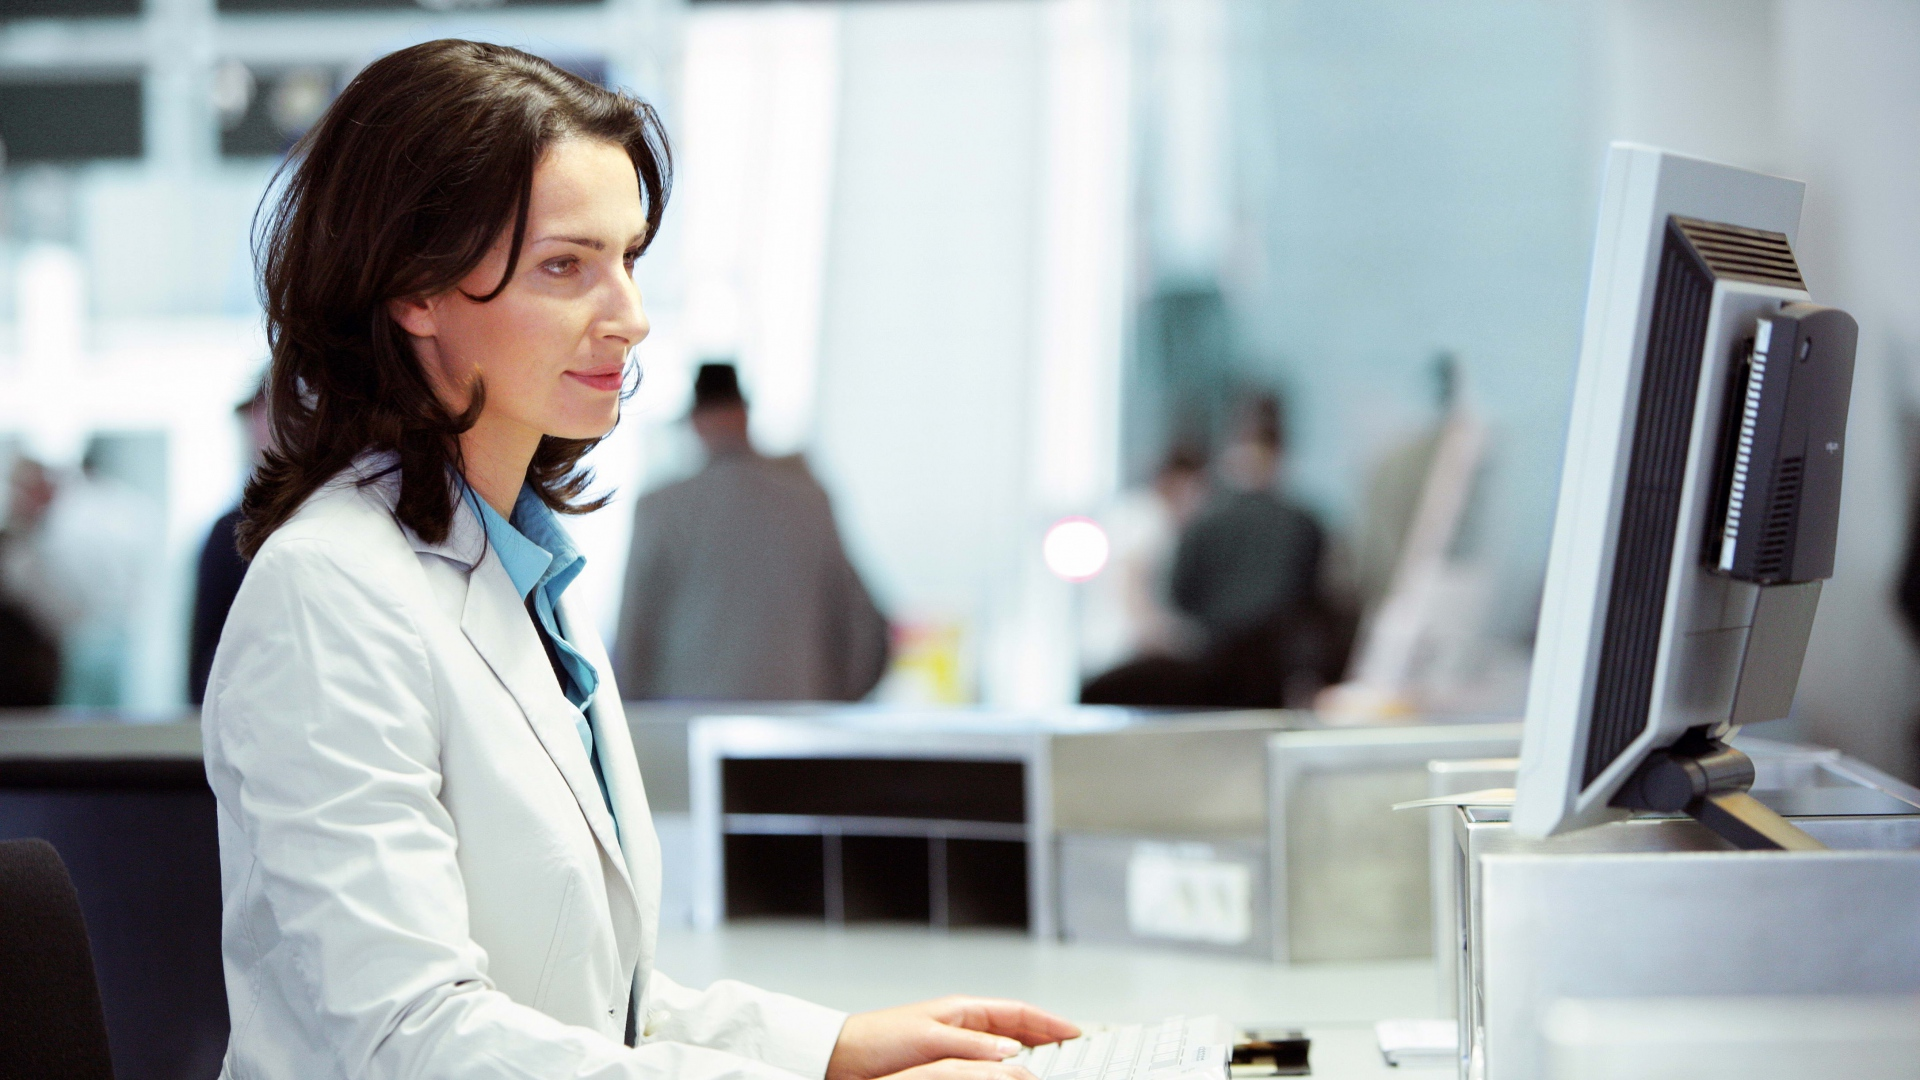 woman_blonde_computer_work_keyboard_monitor_77414_1920x1080